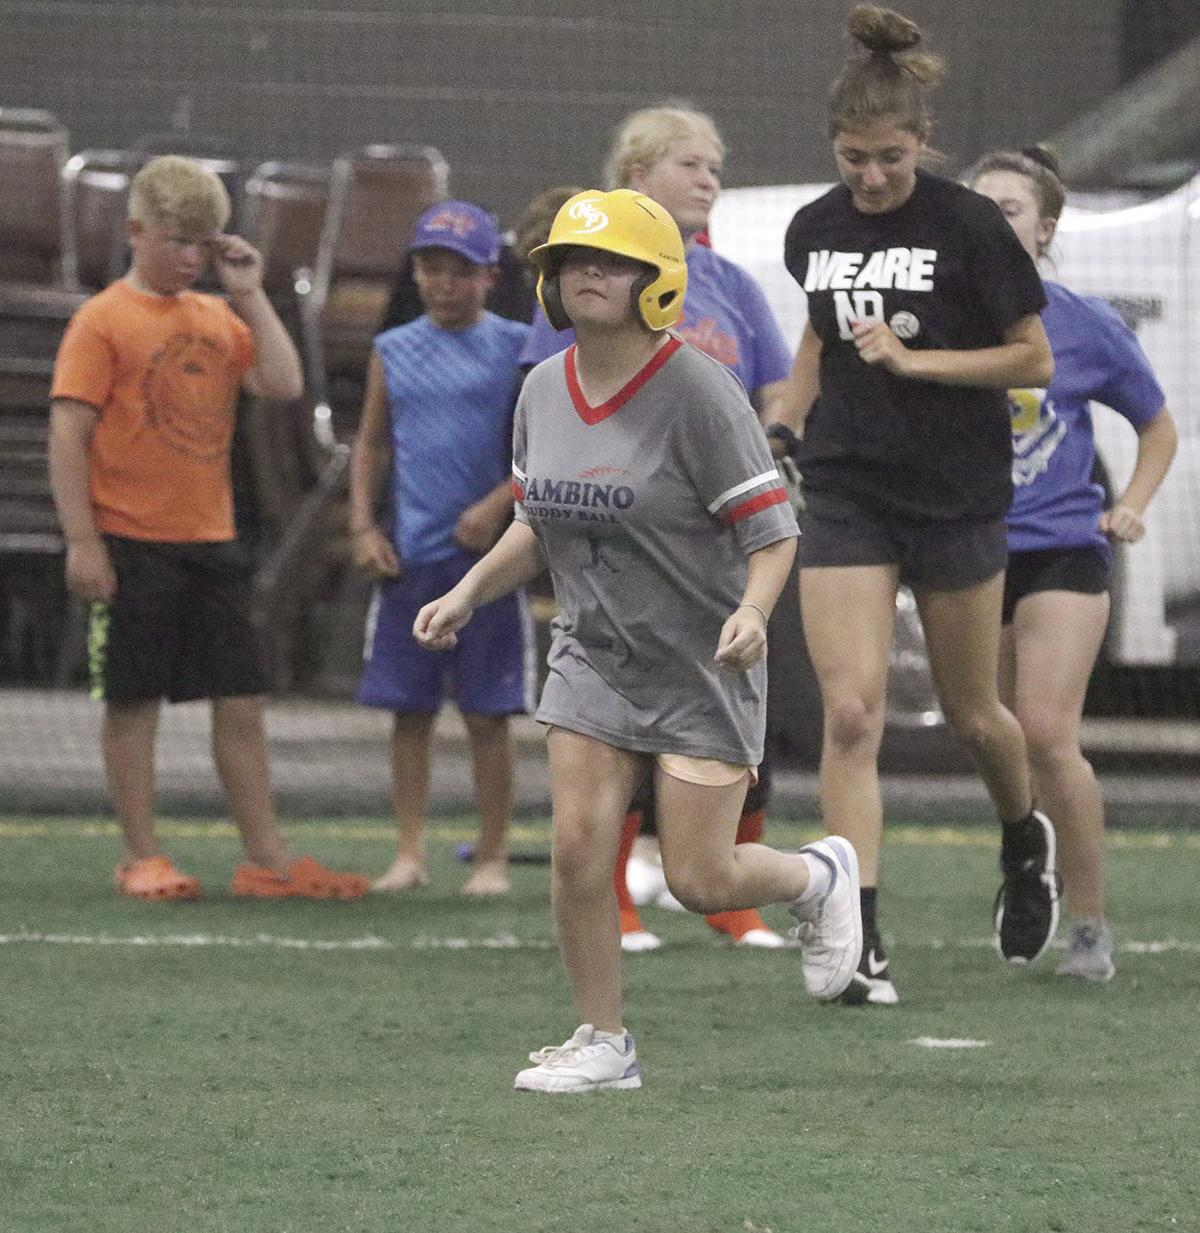 North Platte Bambino Buddy Ball team celebrates 11th season